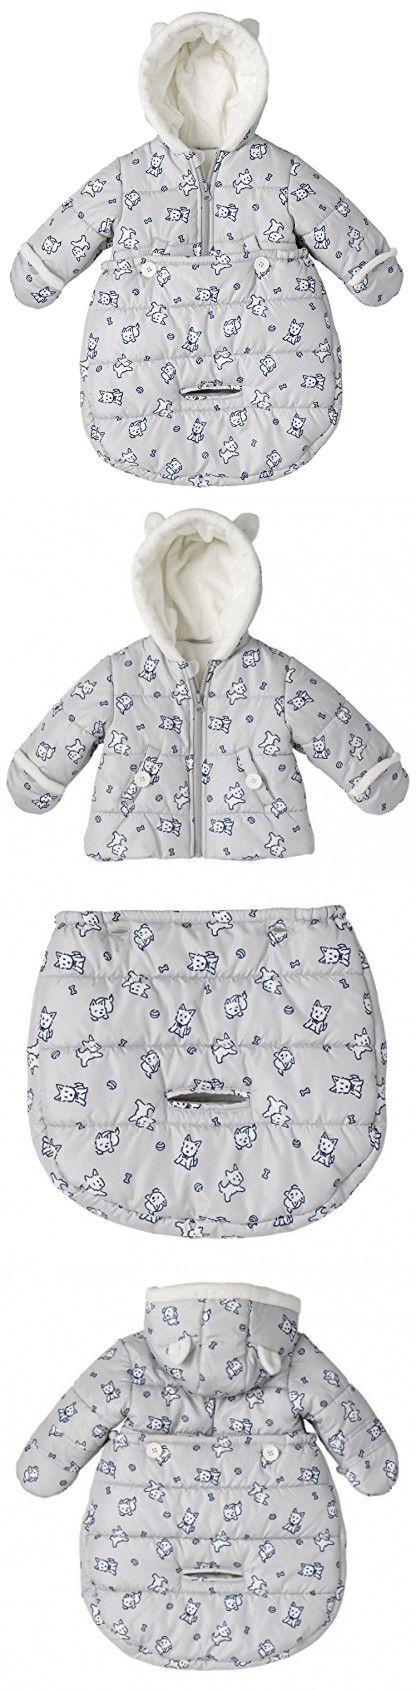 0f383ac89 London Fog Newborn Infant Baby Girl Boy Puffer Carbag Pram Bag Snowsuit  Bunting